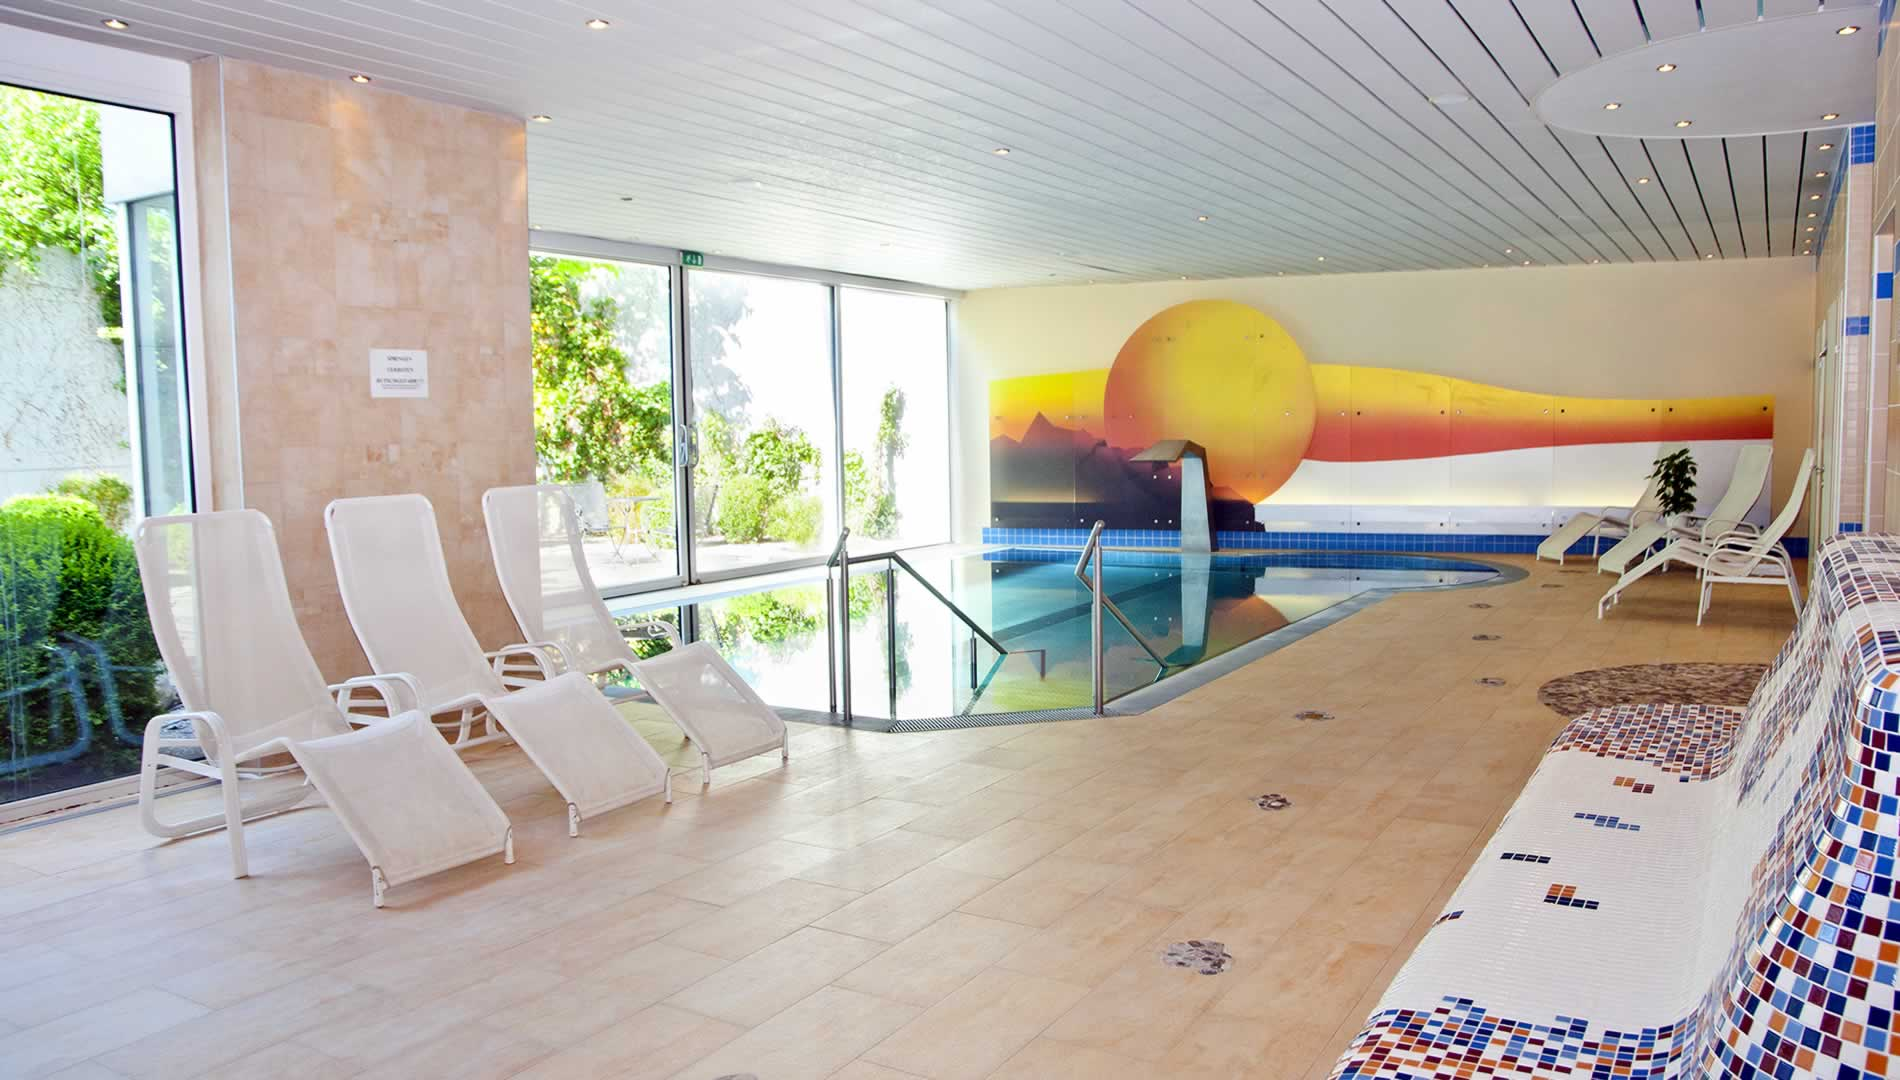 Schwimmbad im Parkhotel Styria in Steyr